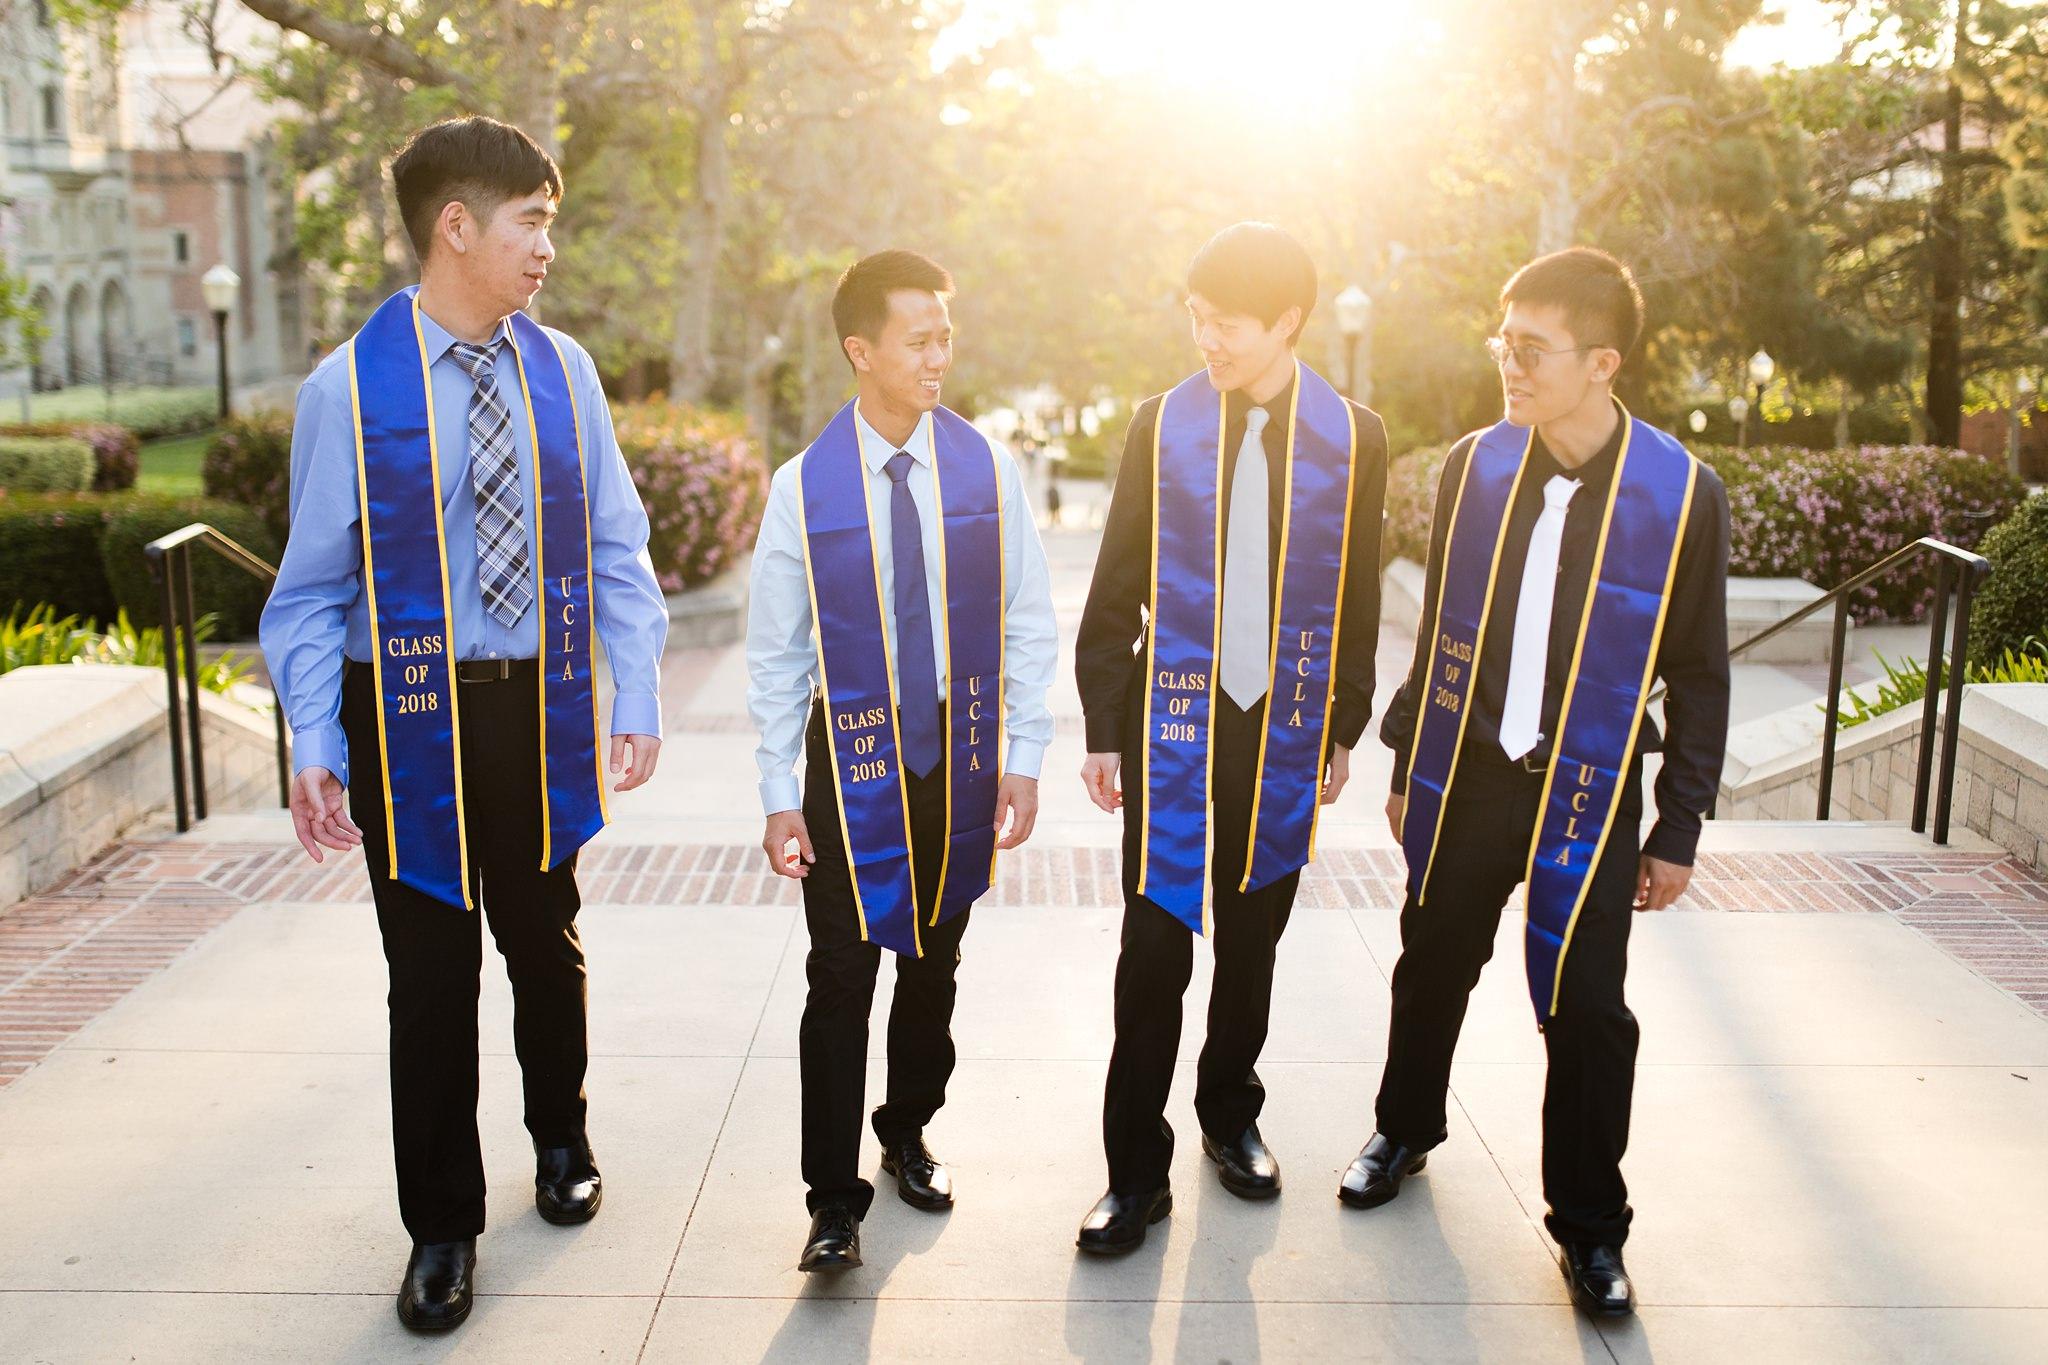 los-angeles-ucla-senior-graduation-portraits-candid-laughing-friends-bruinwalk-at-sunset